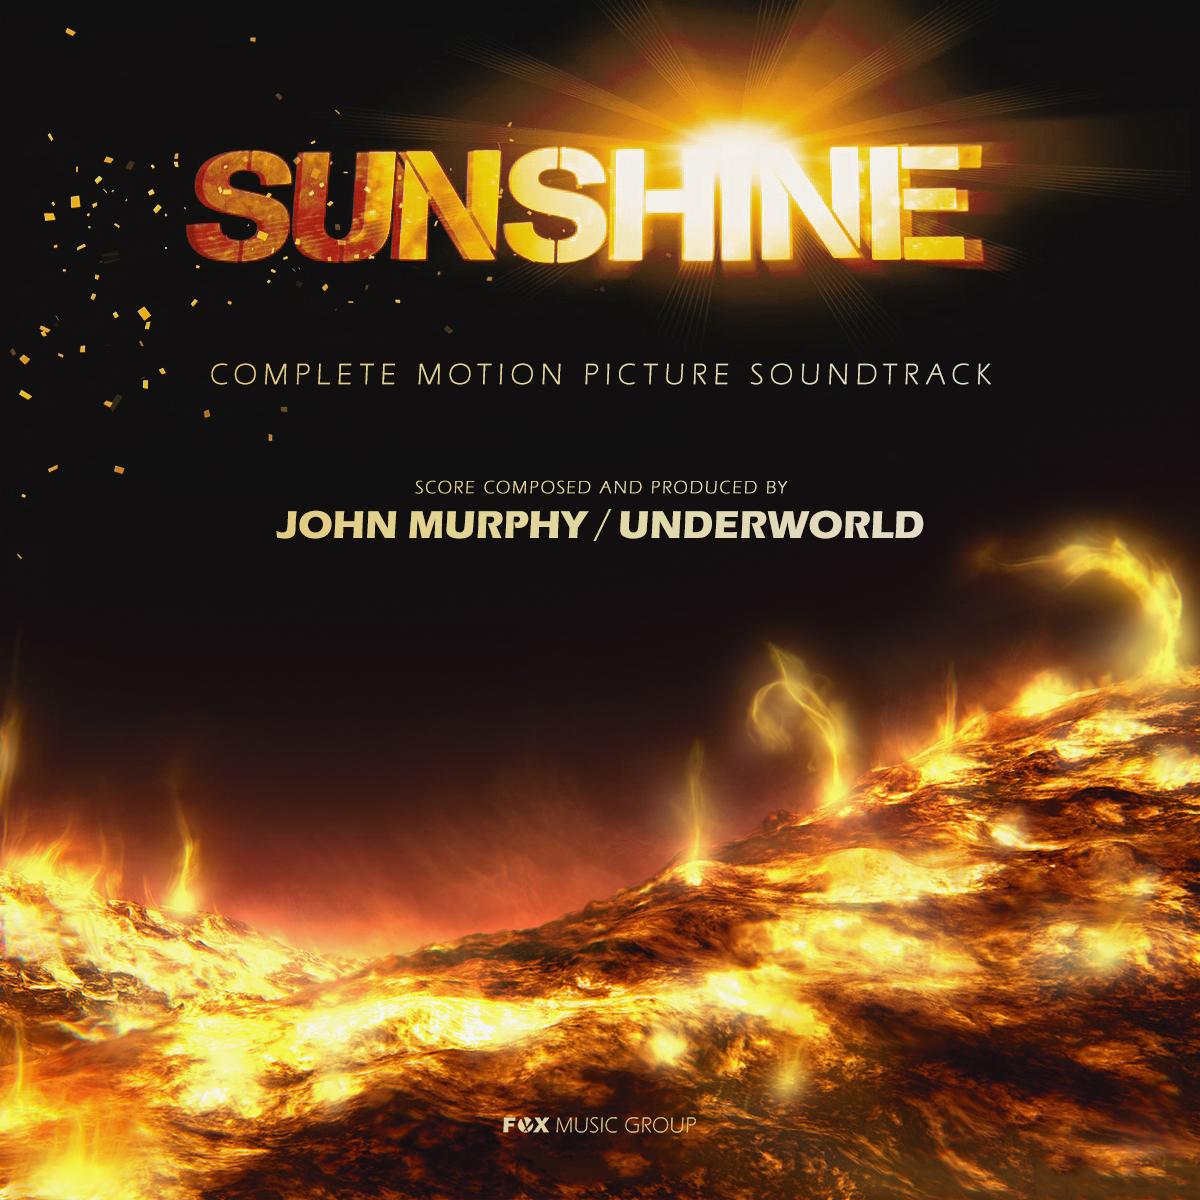 Sunshine Complete Soundtrack Hqcovers